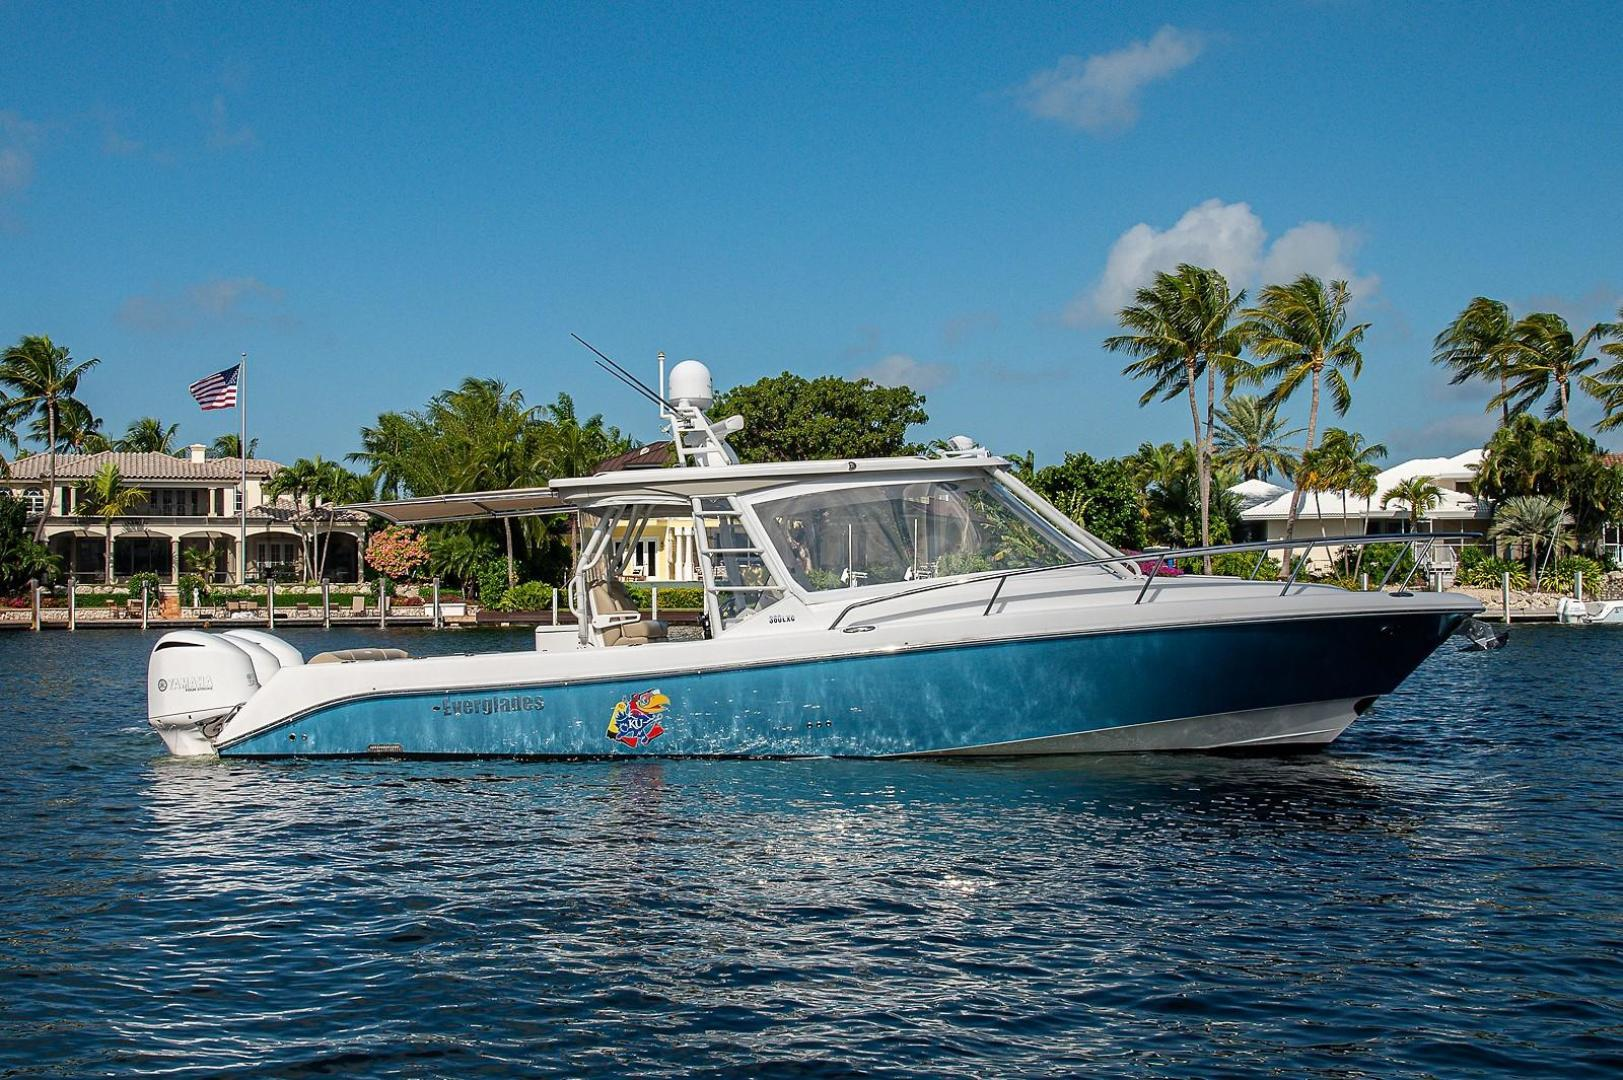 36' Everglades 2016 360 LXC Jayhawker